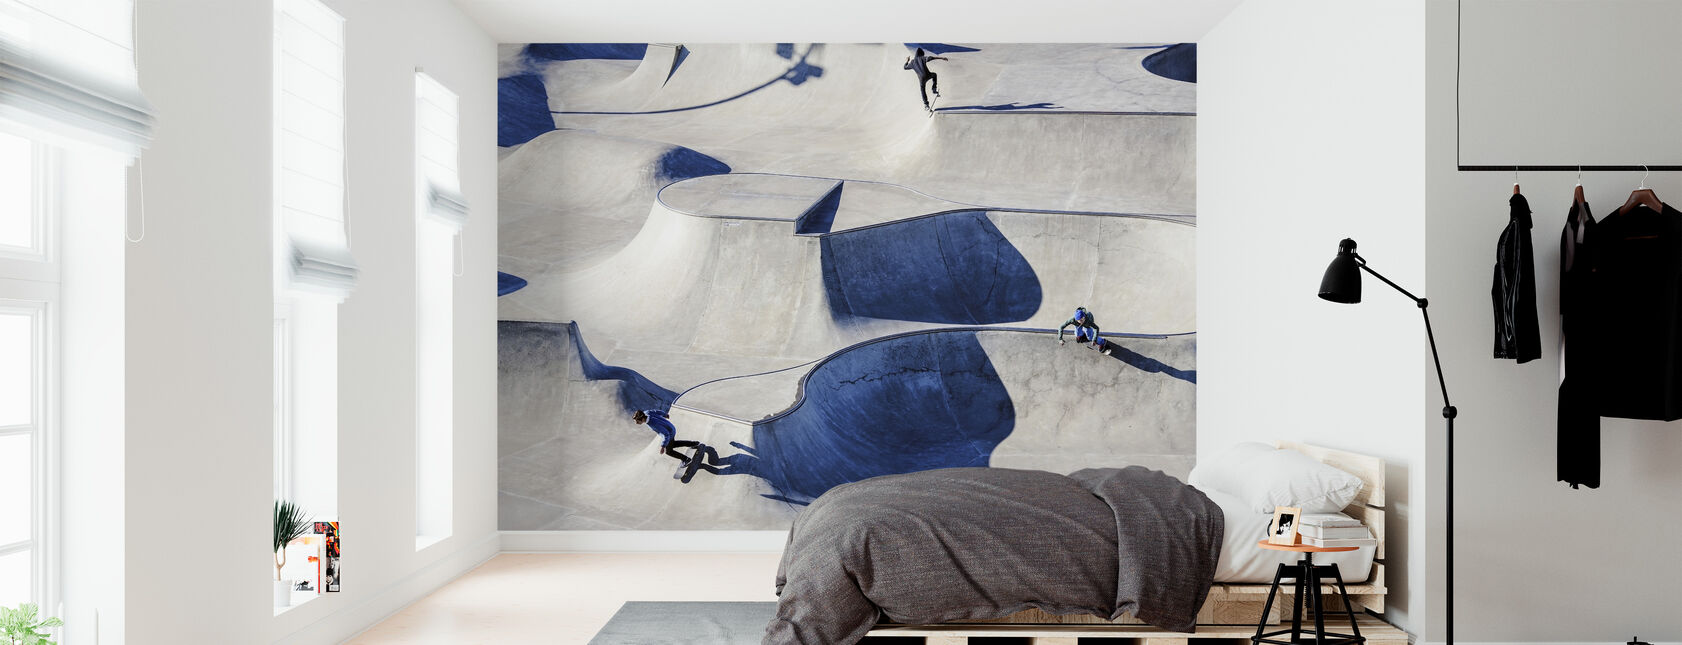 Skateboarding in Park - Wallpaper - Bedroom